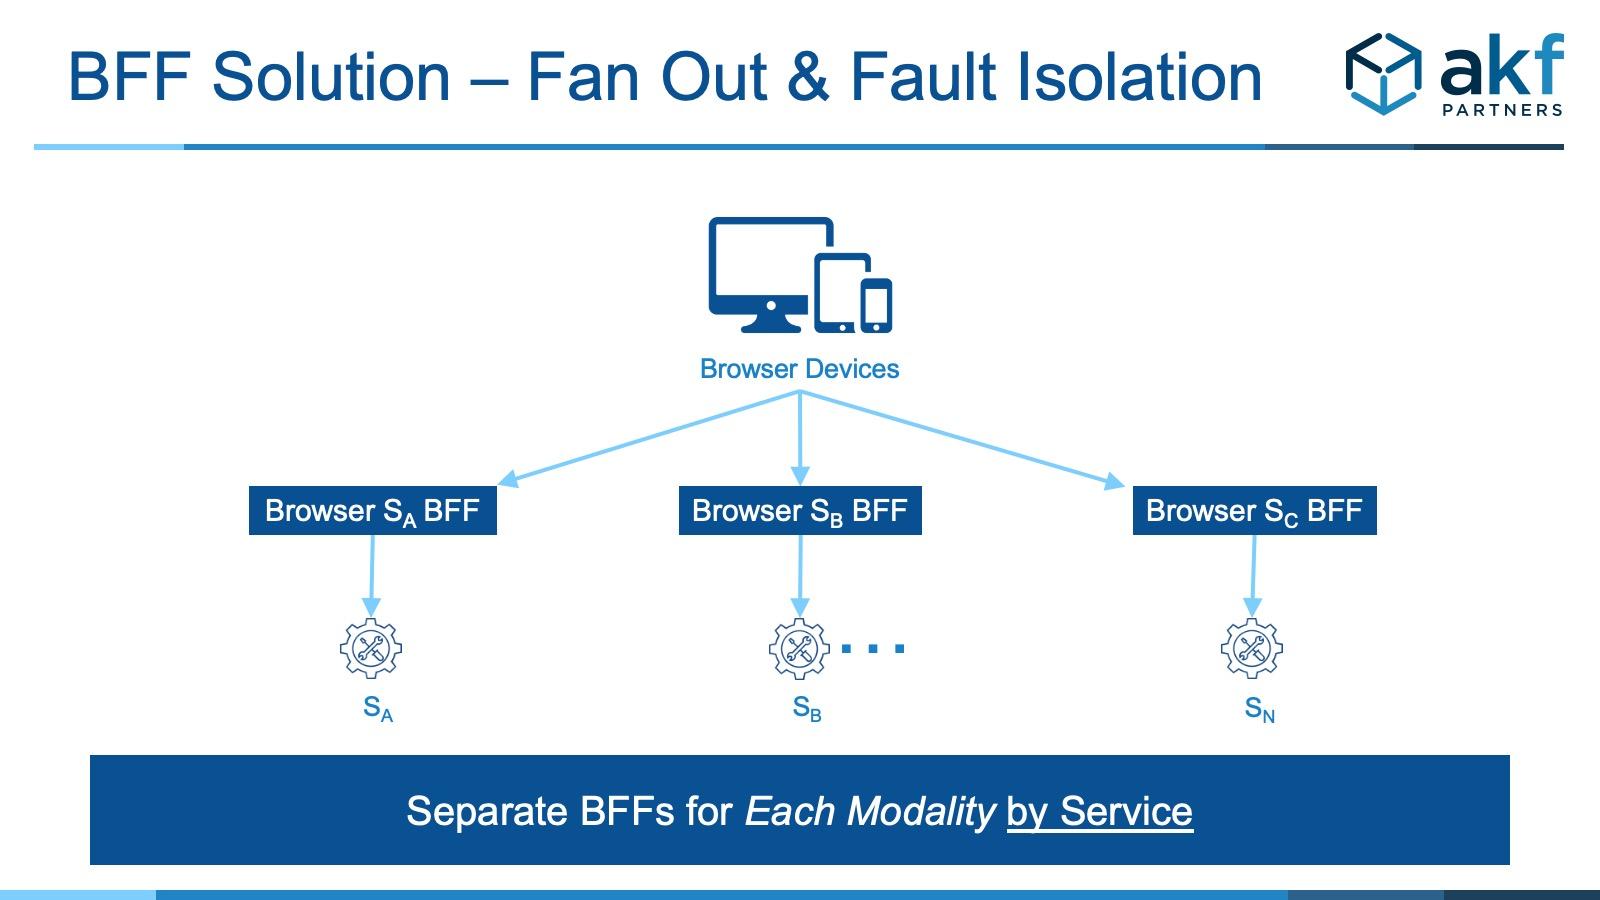 https://akfpartners.com//uploads/blog/BFF_Fan_Out_Solution.jpg